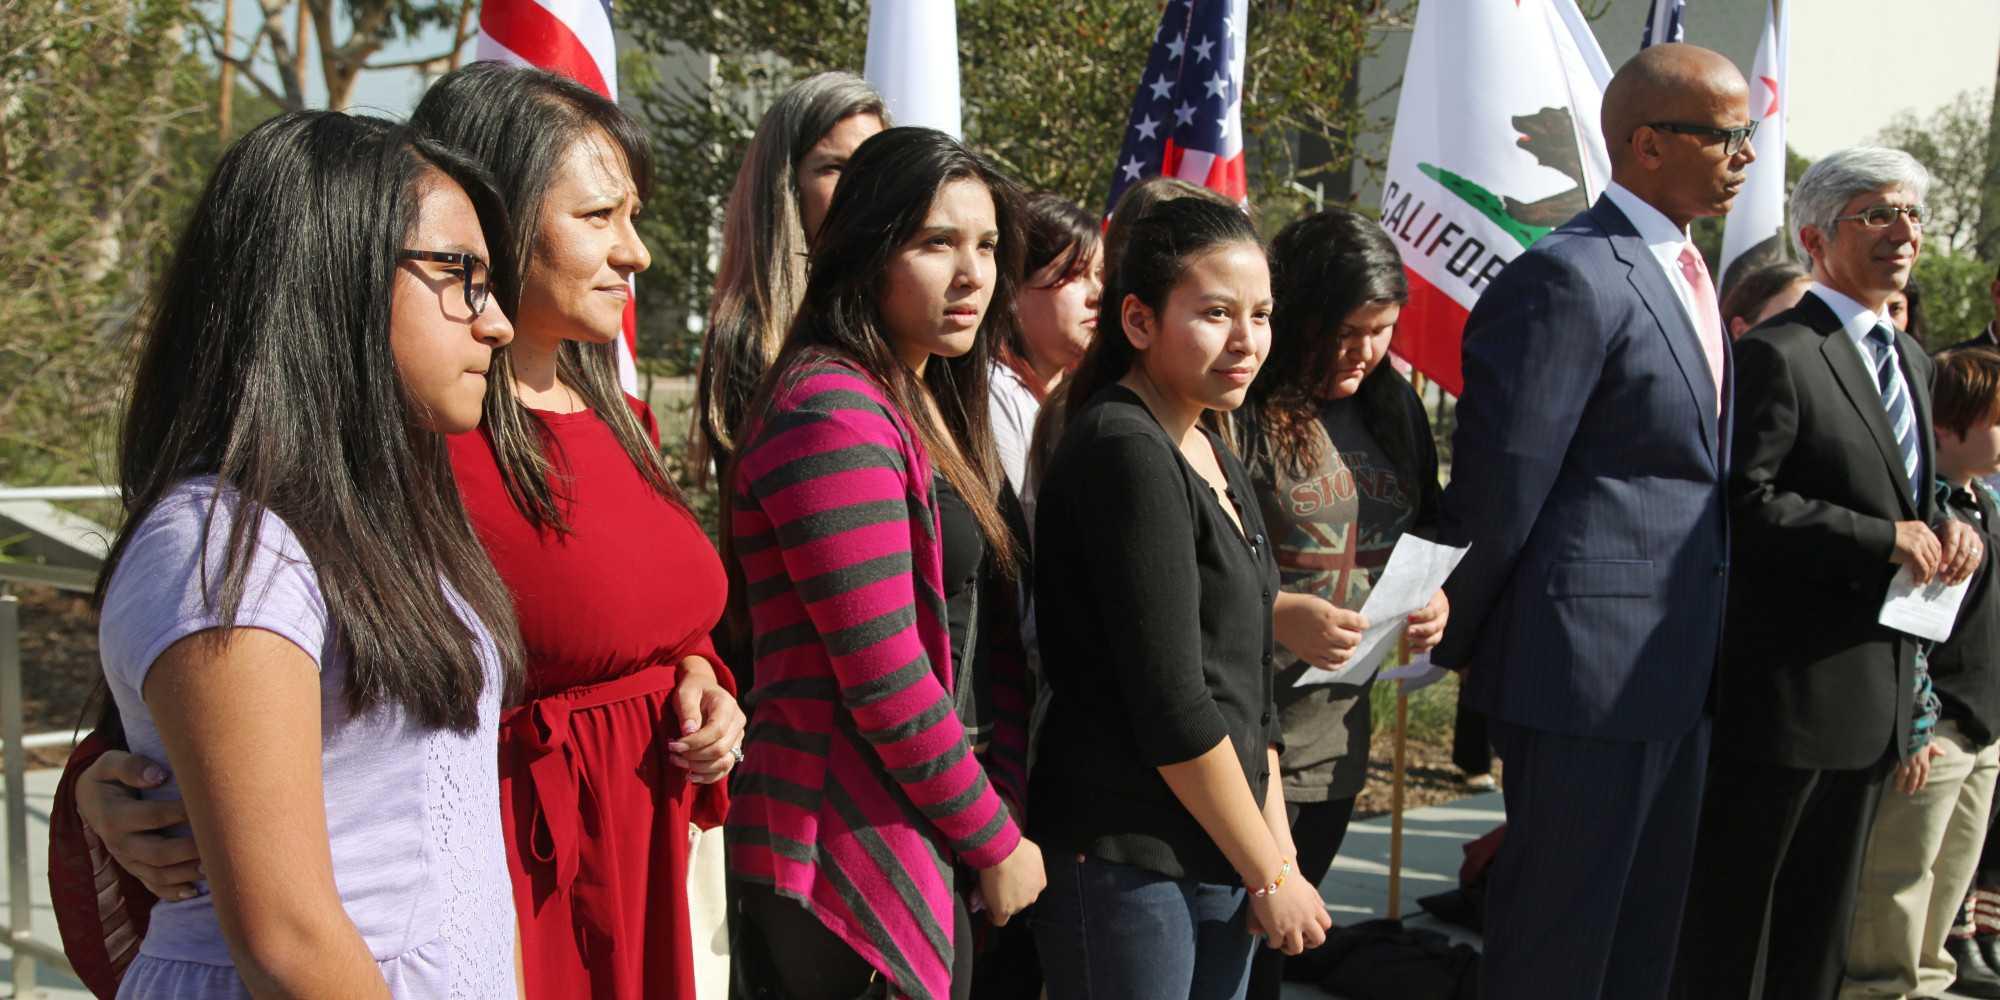 California teacher protection laws struck down